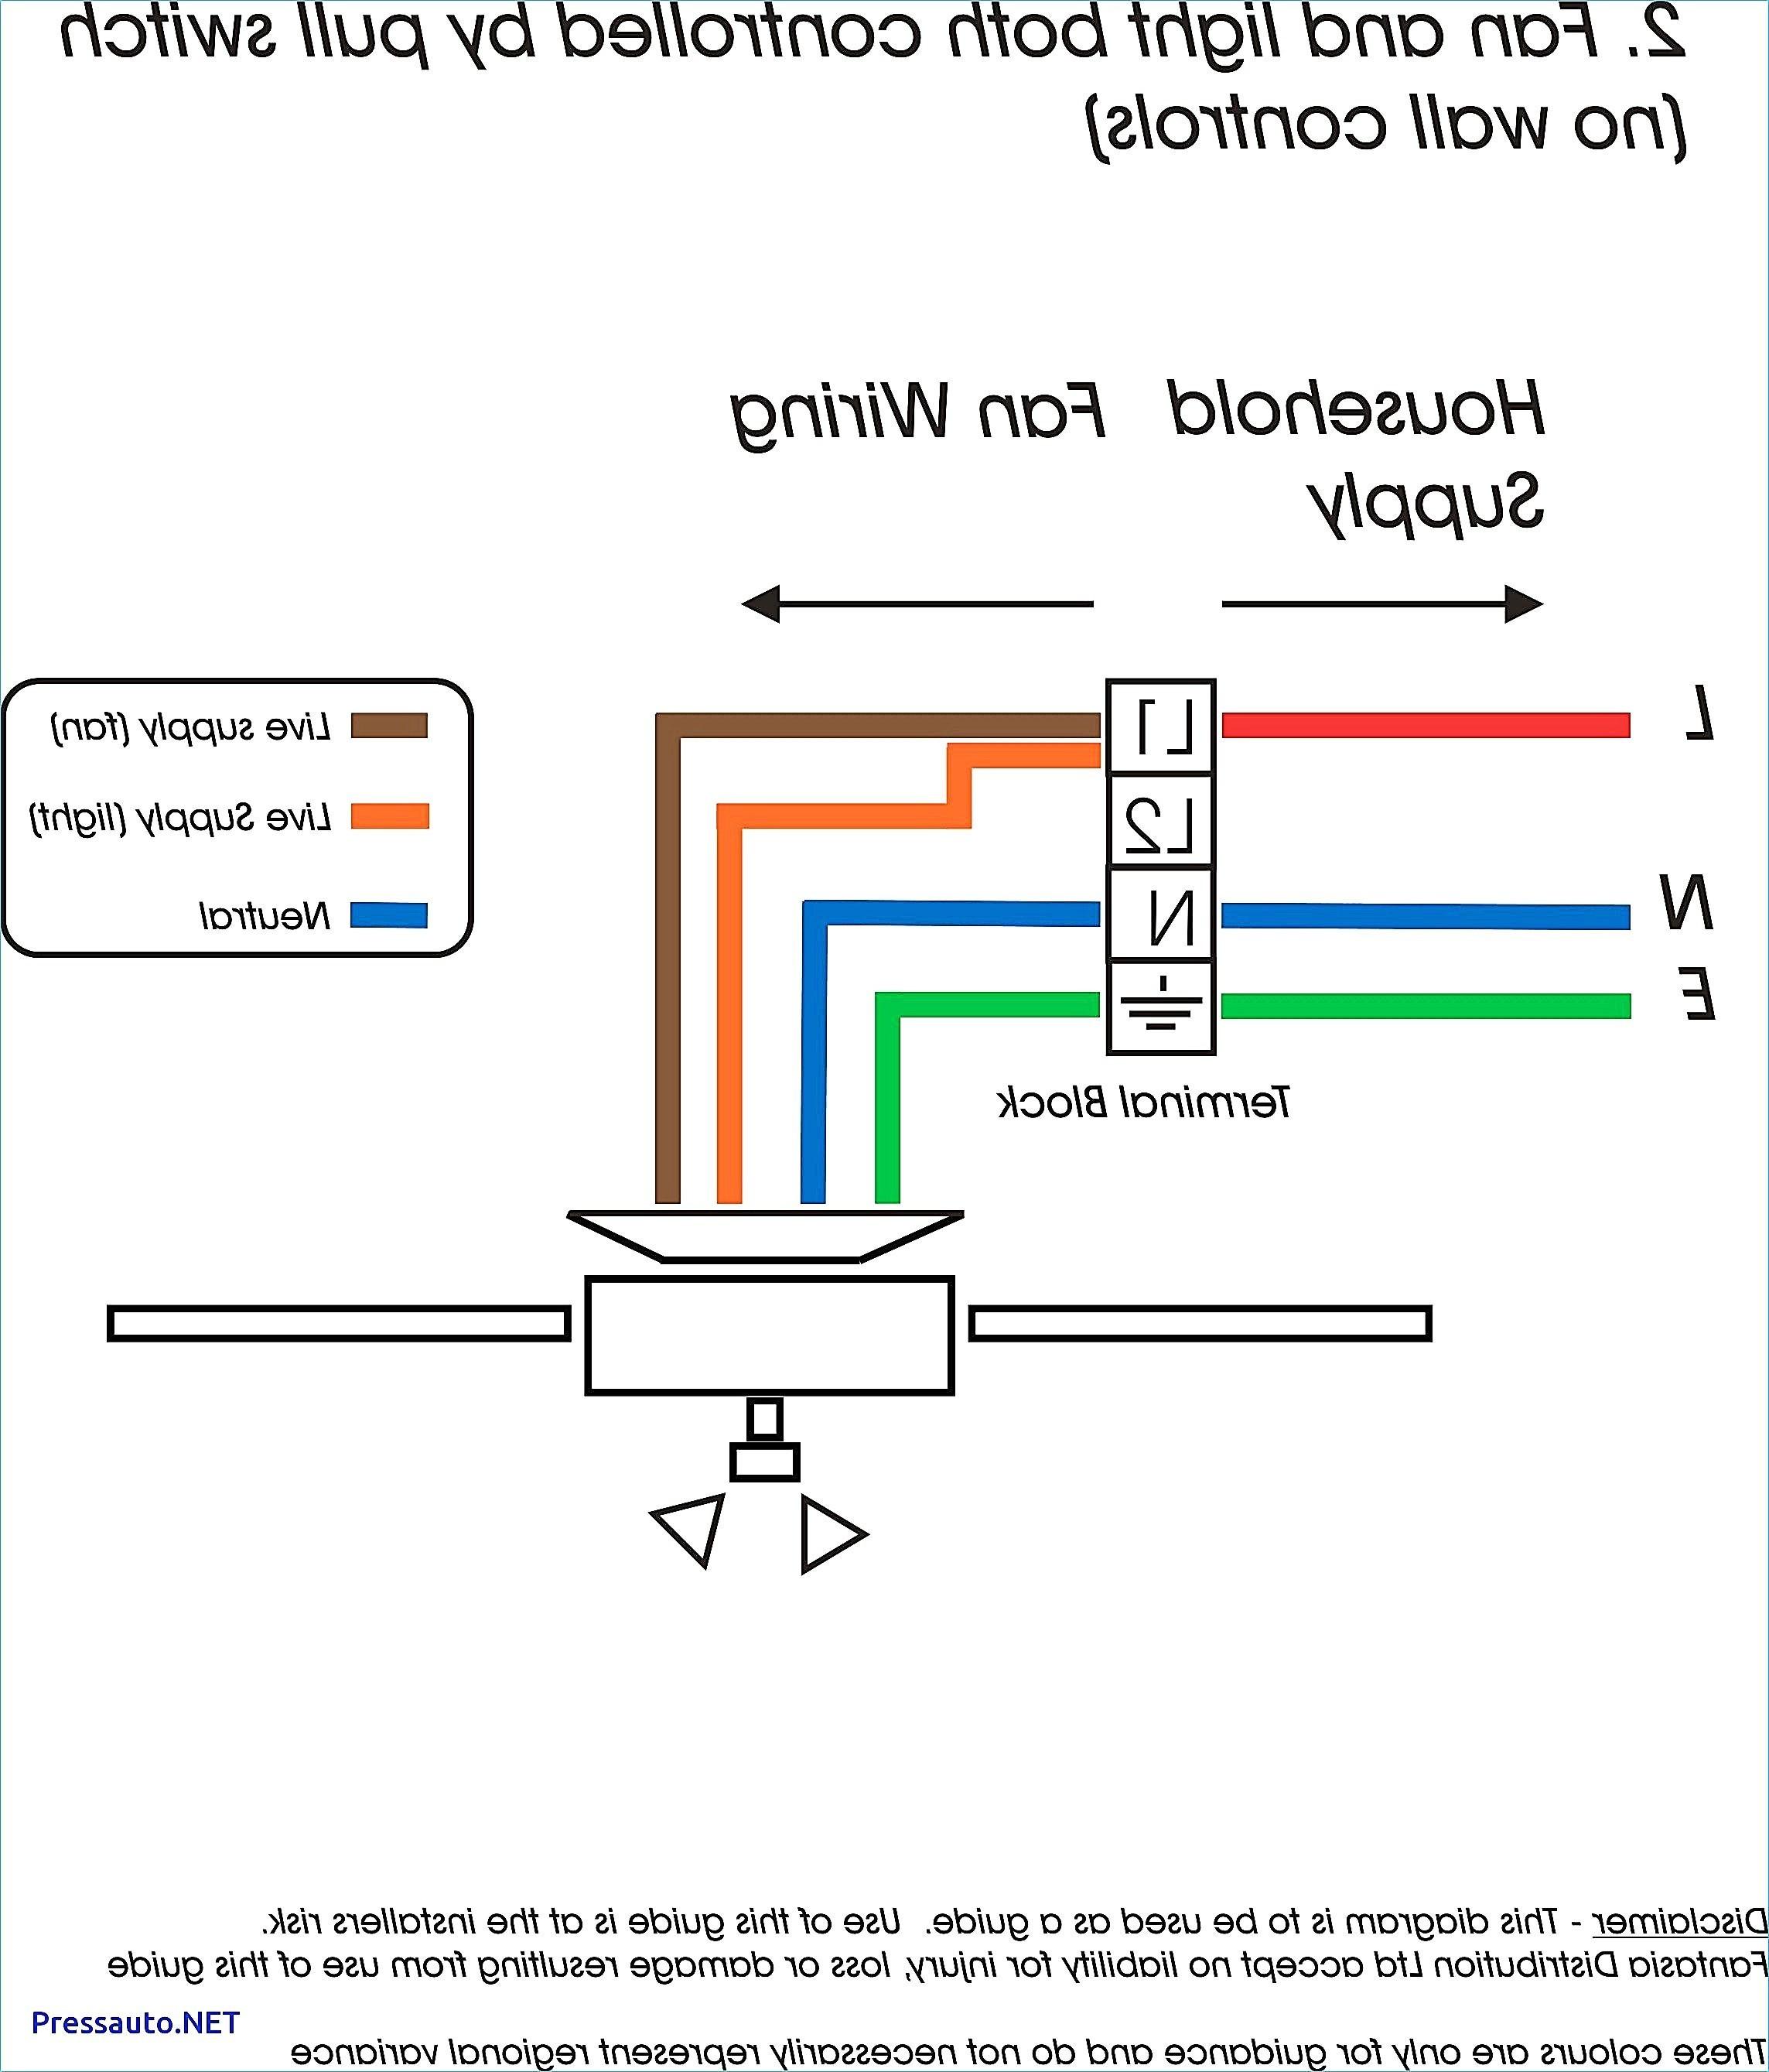 Honeywell Rth3100c thermostat Wiring Diagram Wiring Diagram for Honeywell thermostat 2018 Wiring Diagram for Of Honeywell Rth3100c thermostat Wiring Diagram